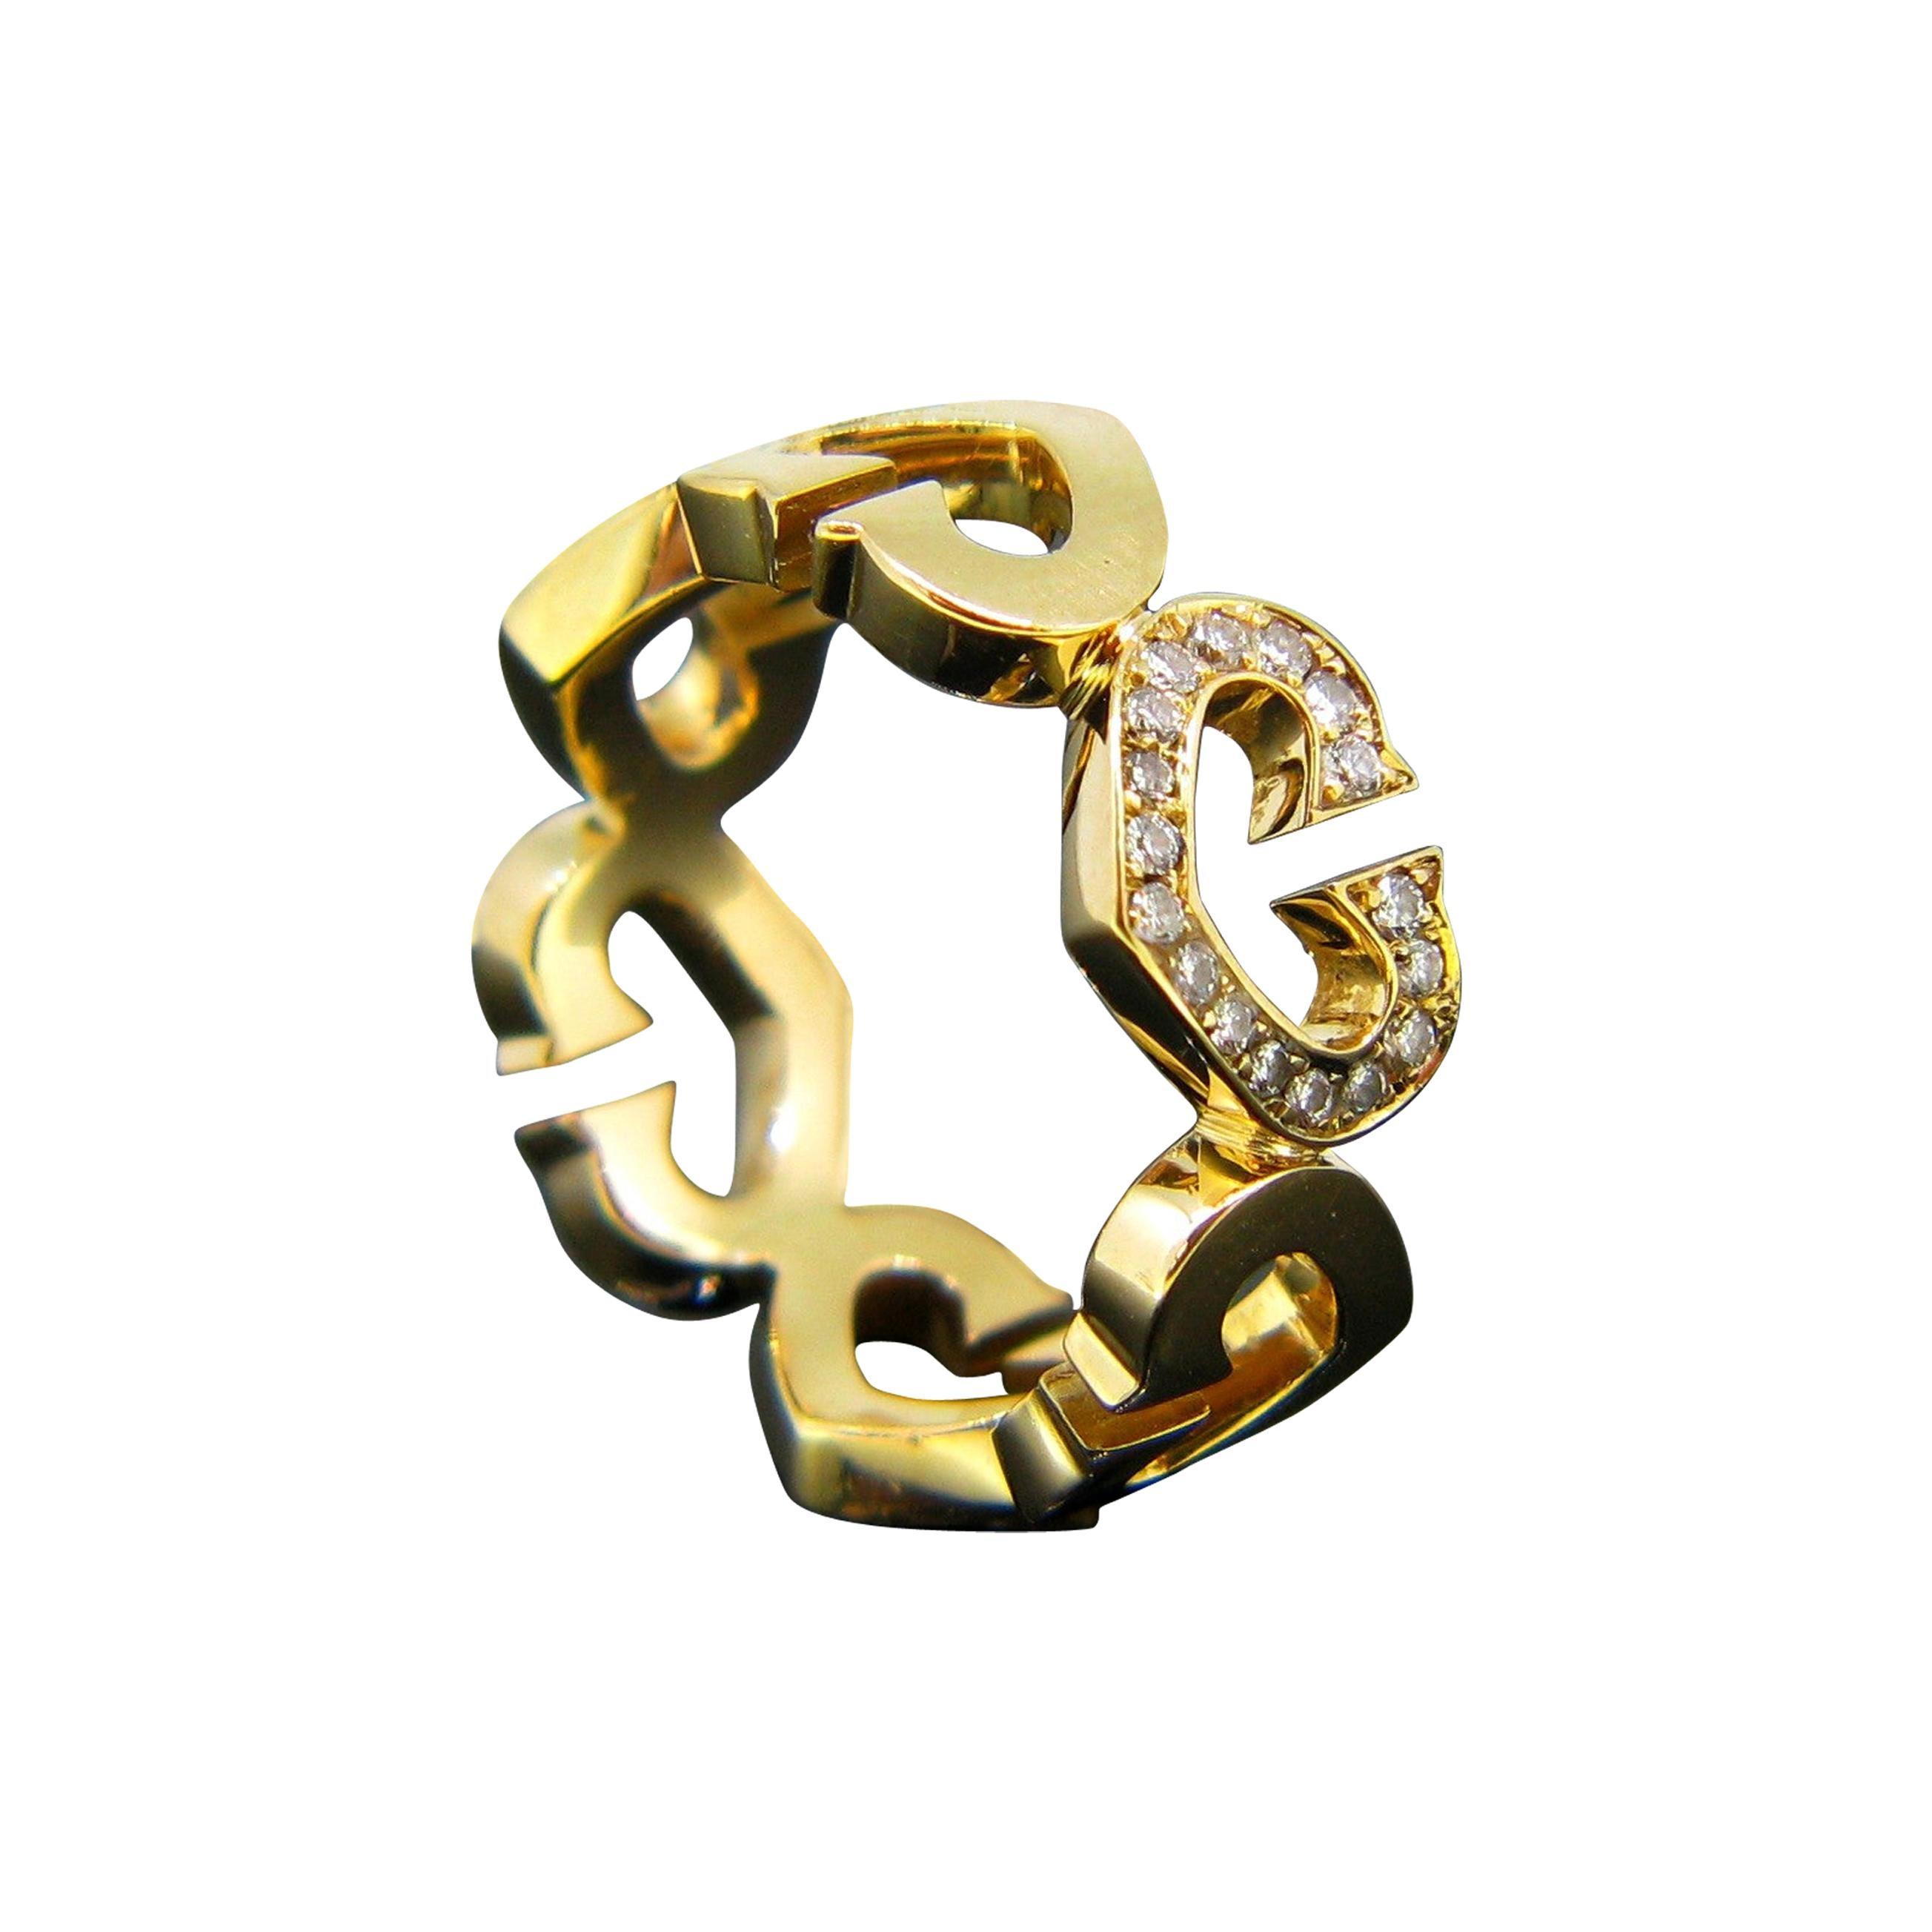 C Heart of Cartier Yellow Gold Diamonds Band Ring